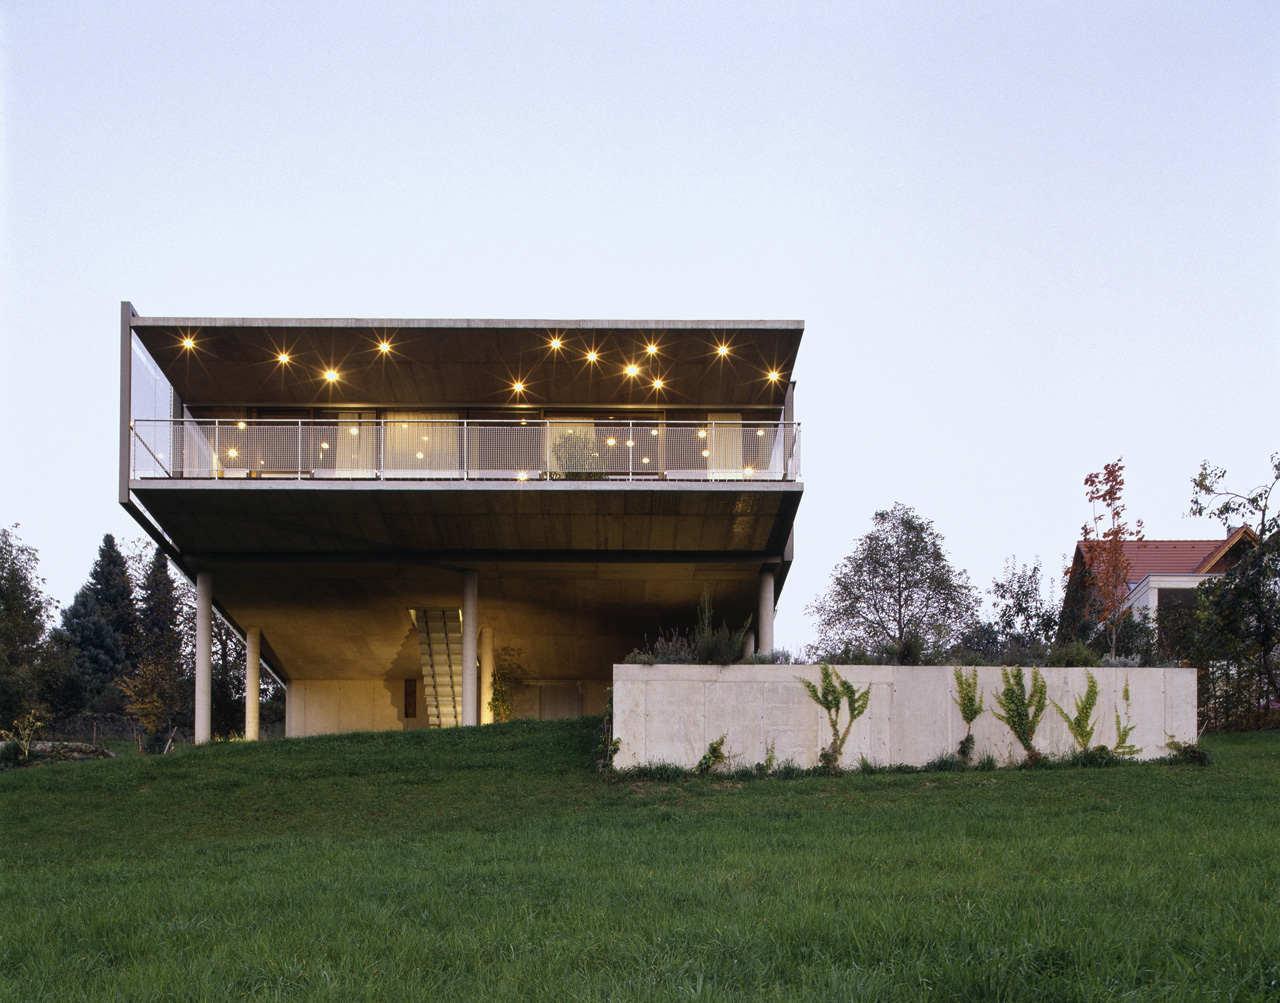 Schmuck House / Gangoly & Kristiner Architekten, © Paul Ott photografiert